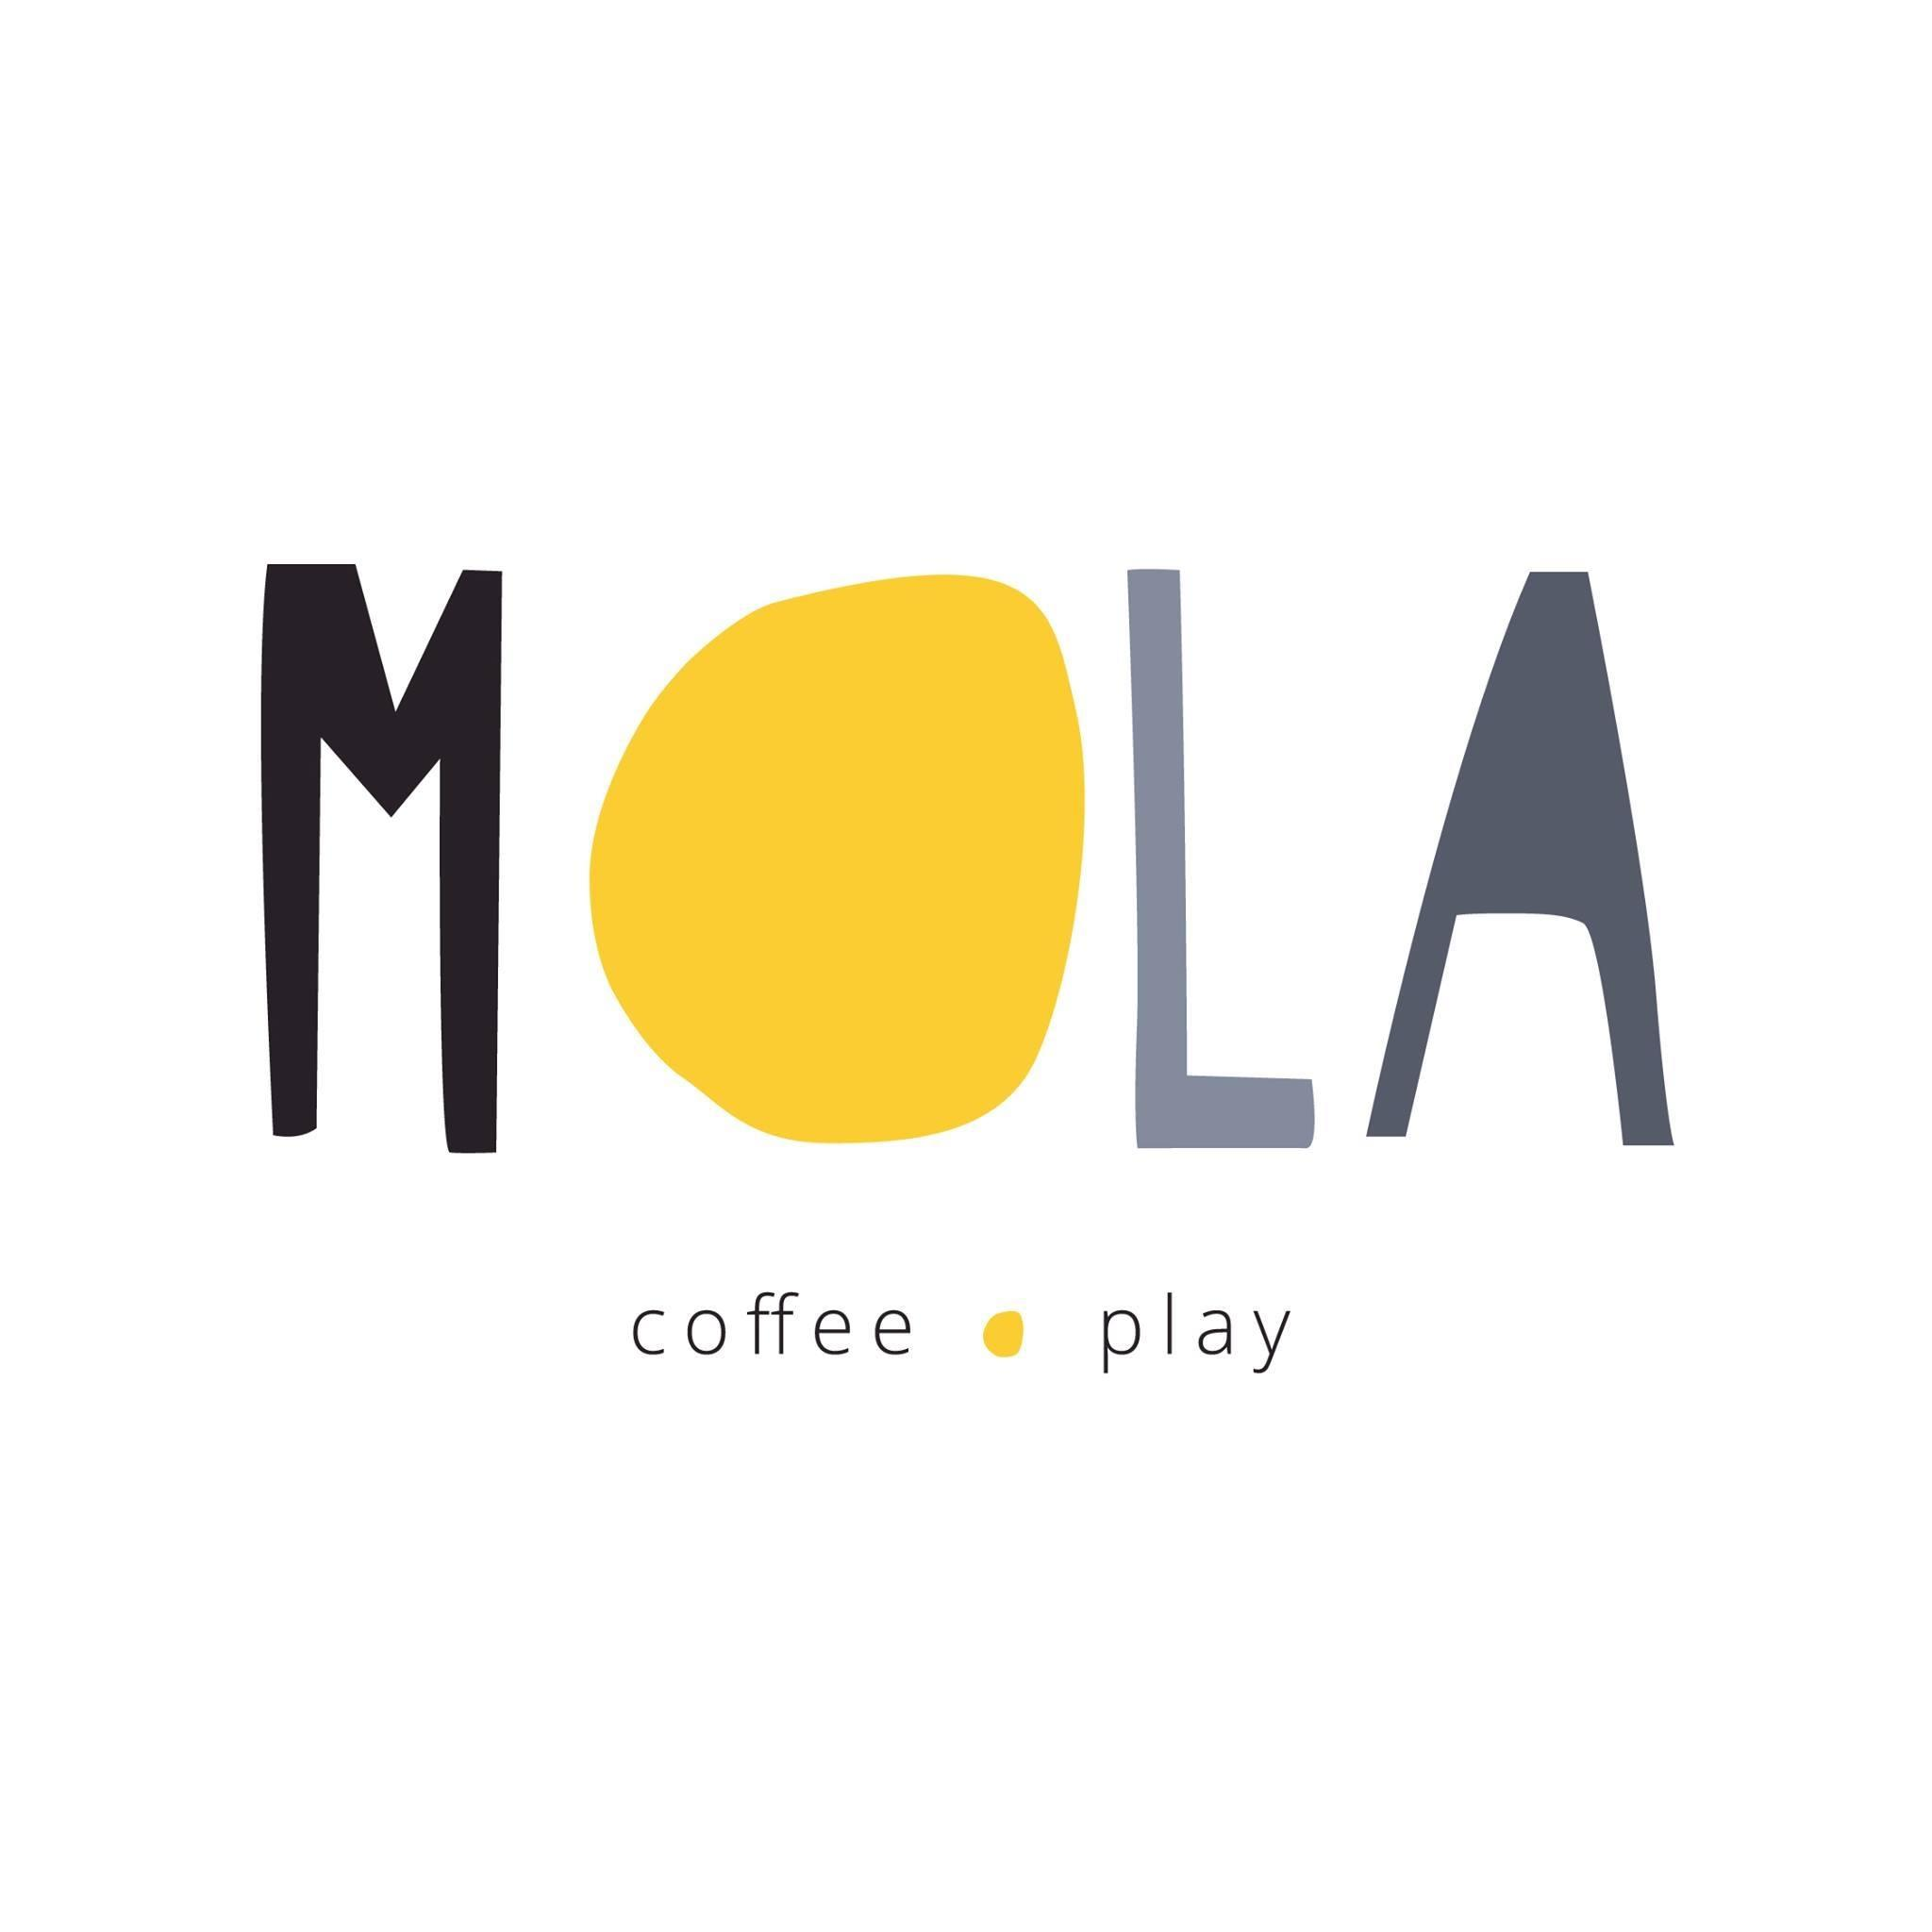 MOLA COFFEE & PLAY